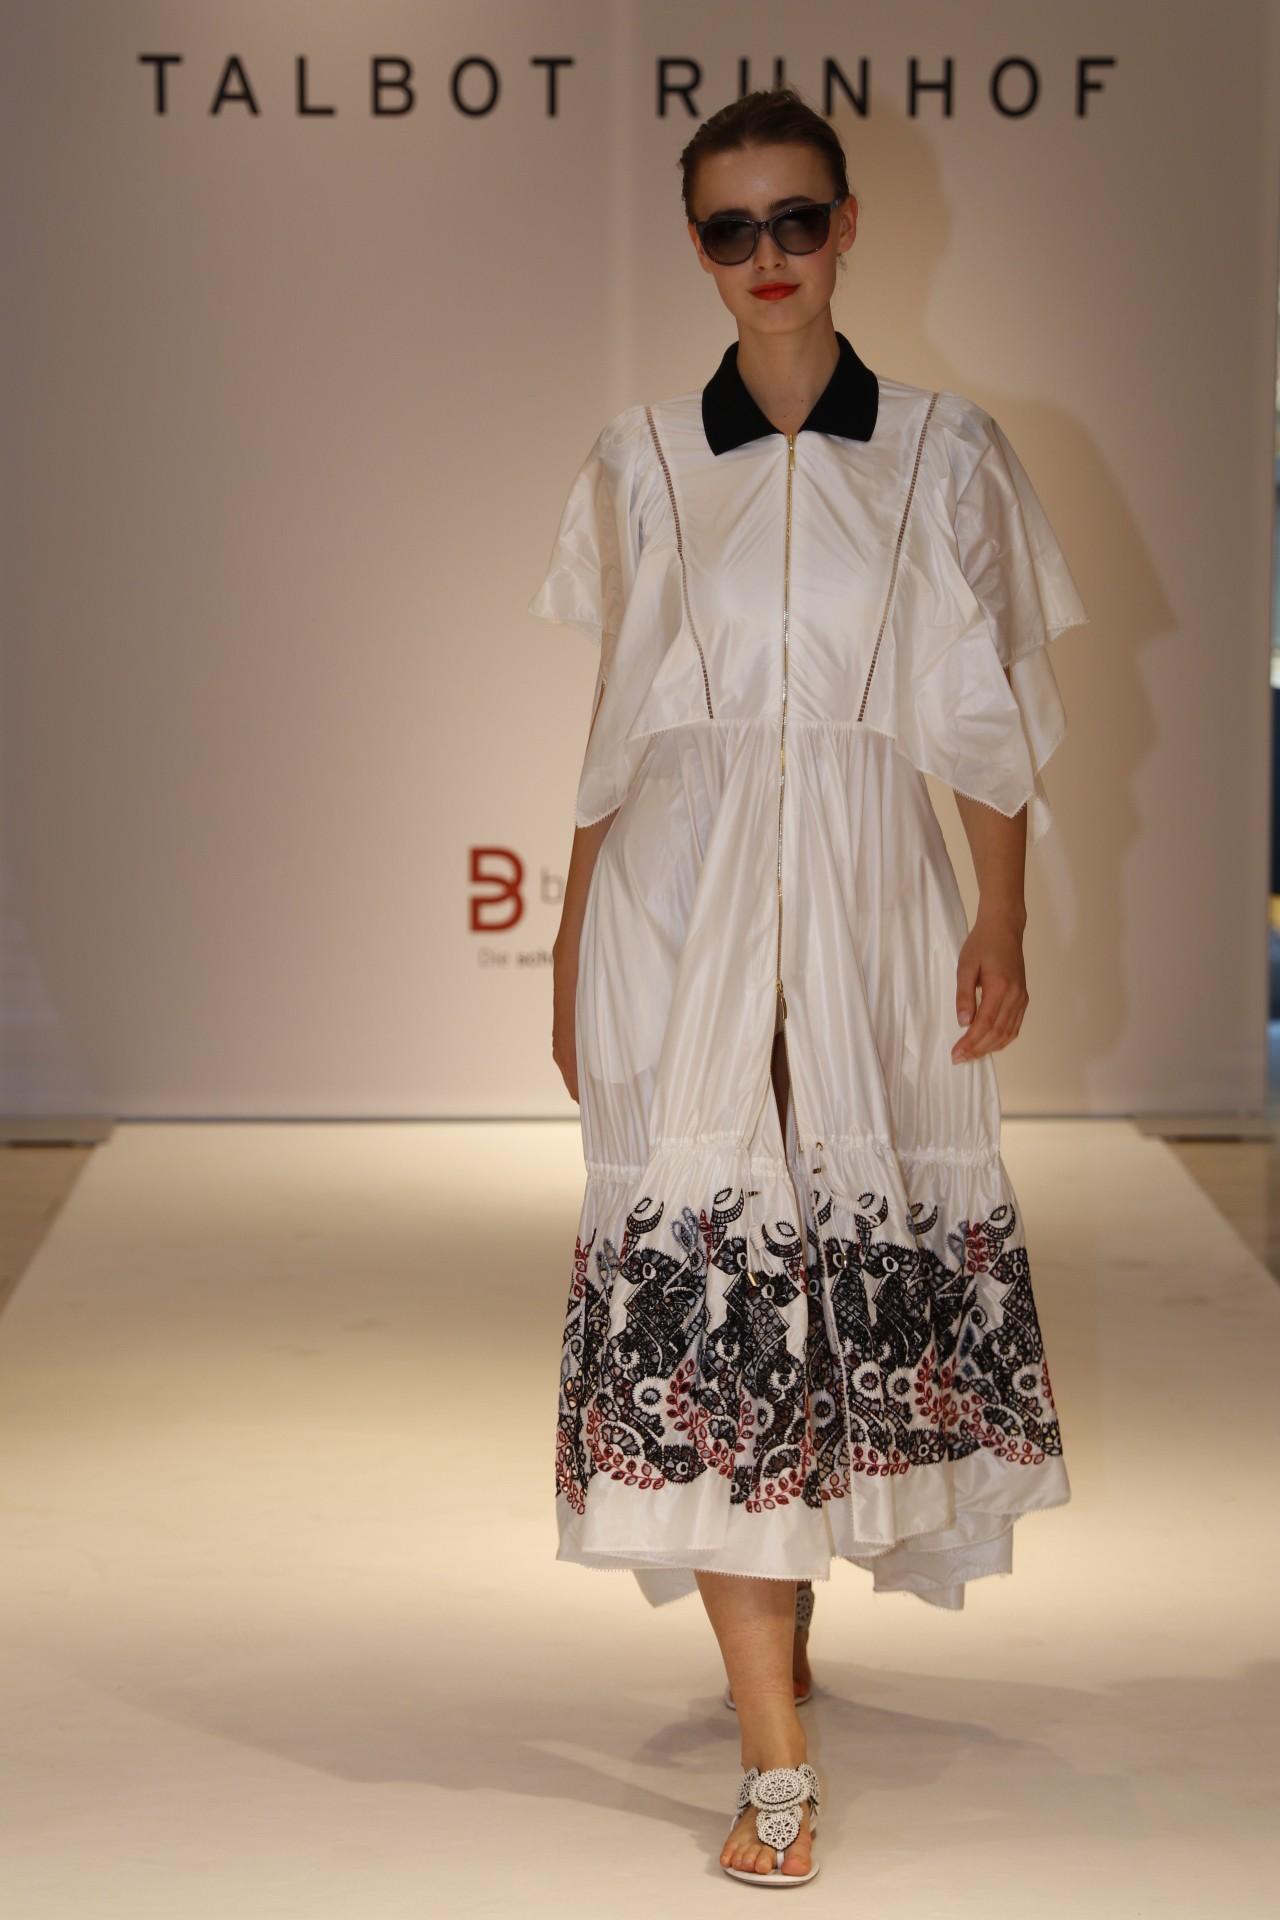 Talbot Runhof Kleid, Talbot Runhof Fashion Show, Breuninger Düsseldorf, Fashion-Blog, Lieblingsstil.com,2